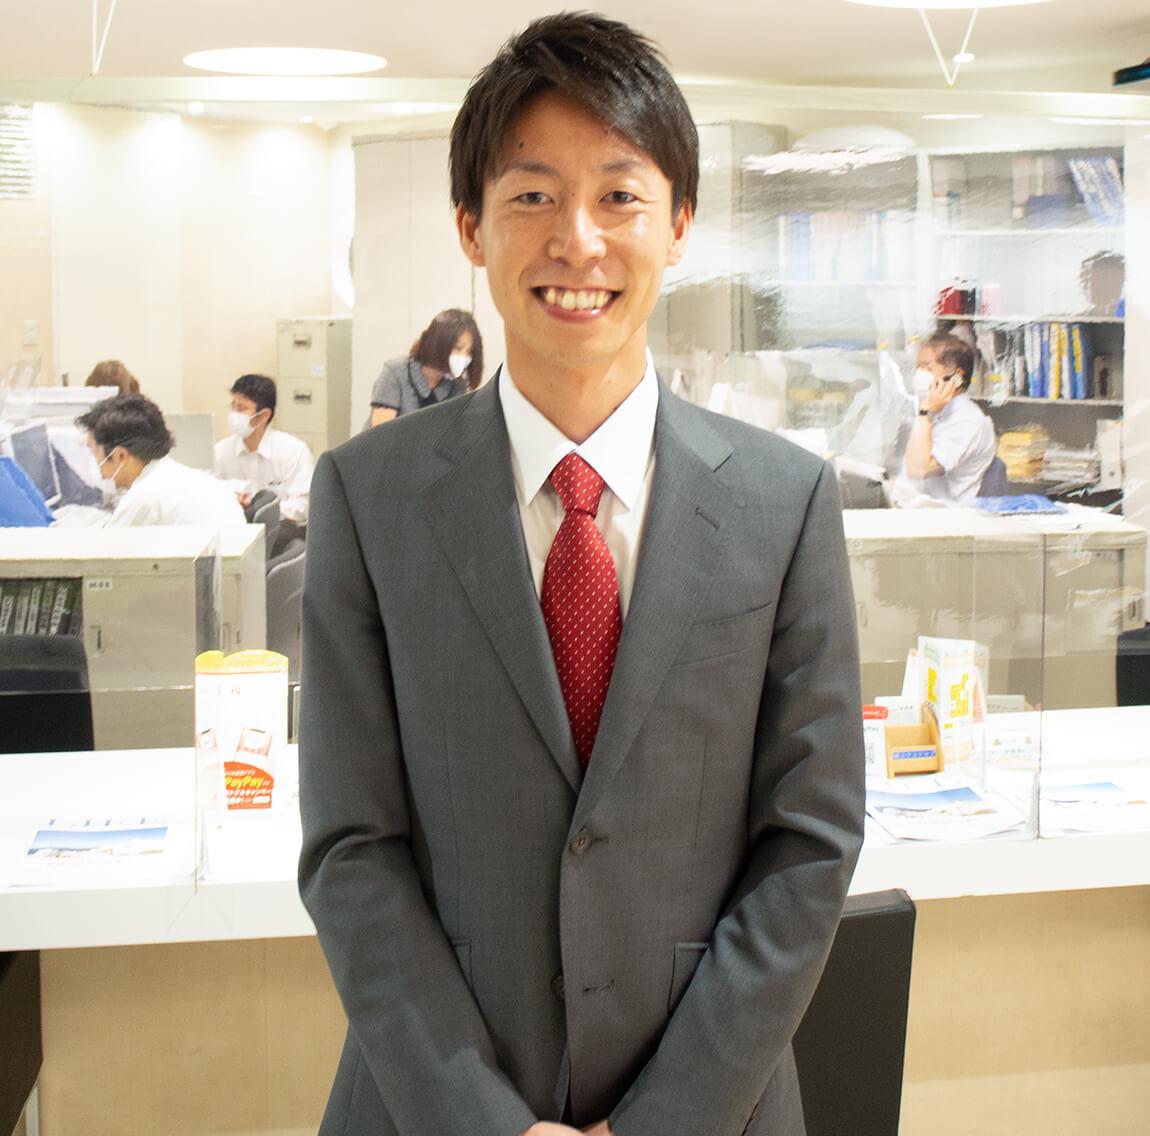 真砂 慎太郎の写真